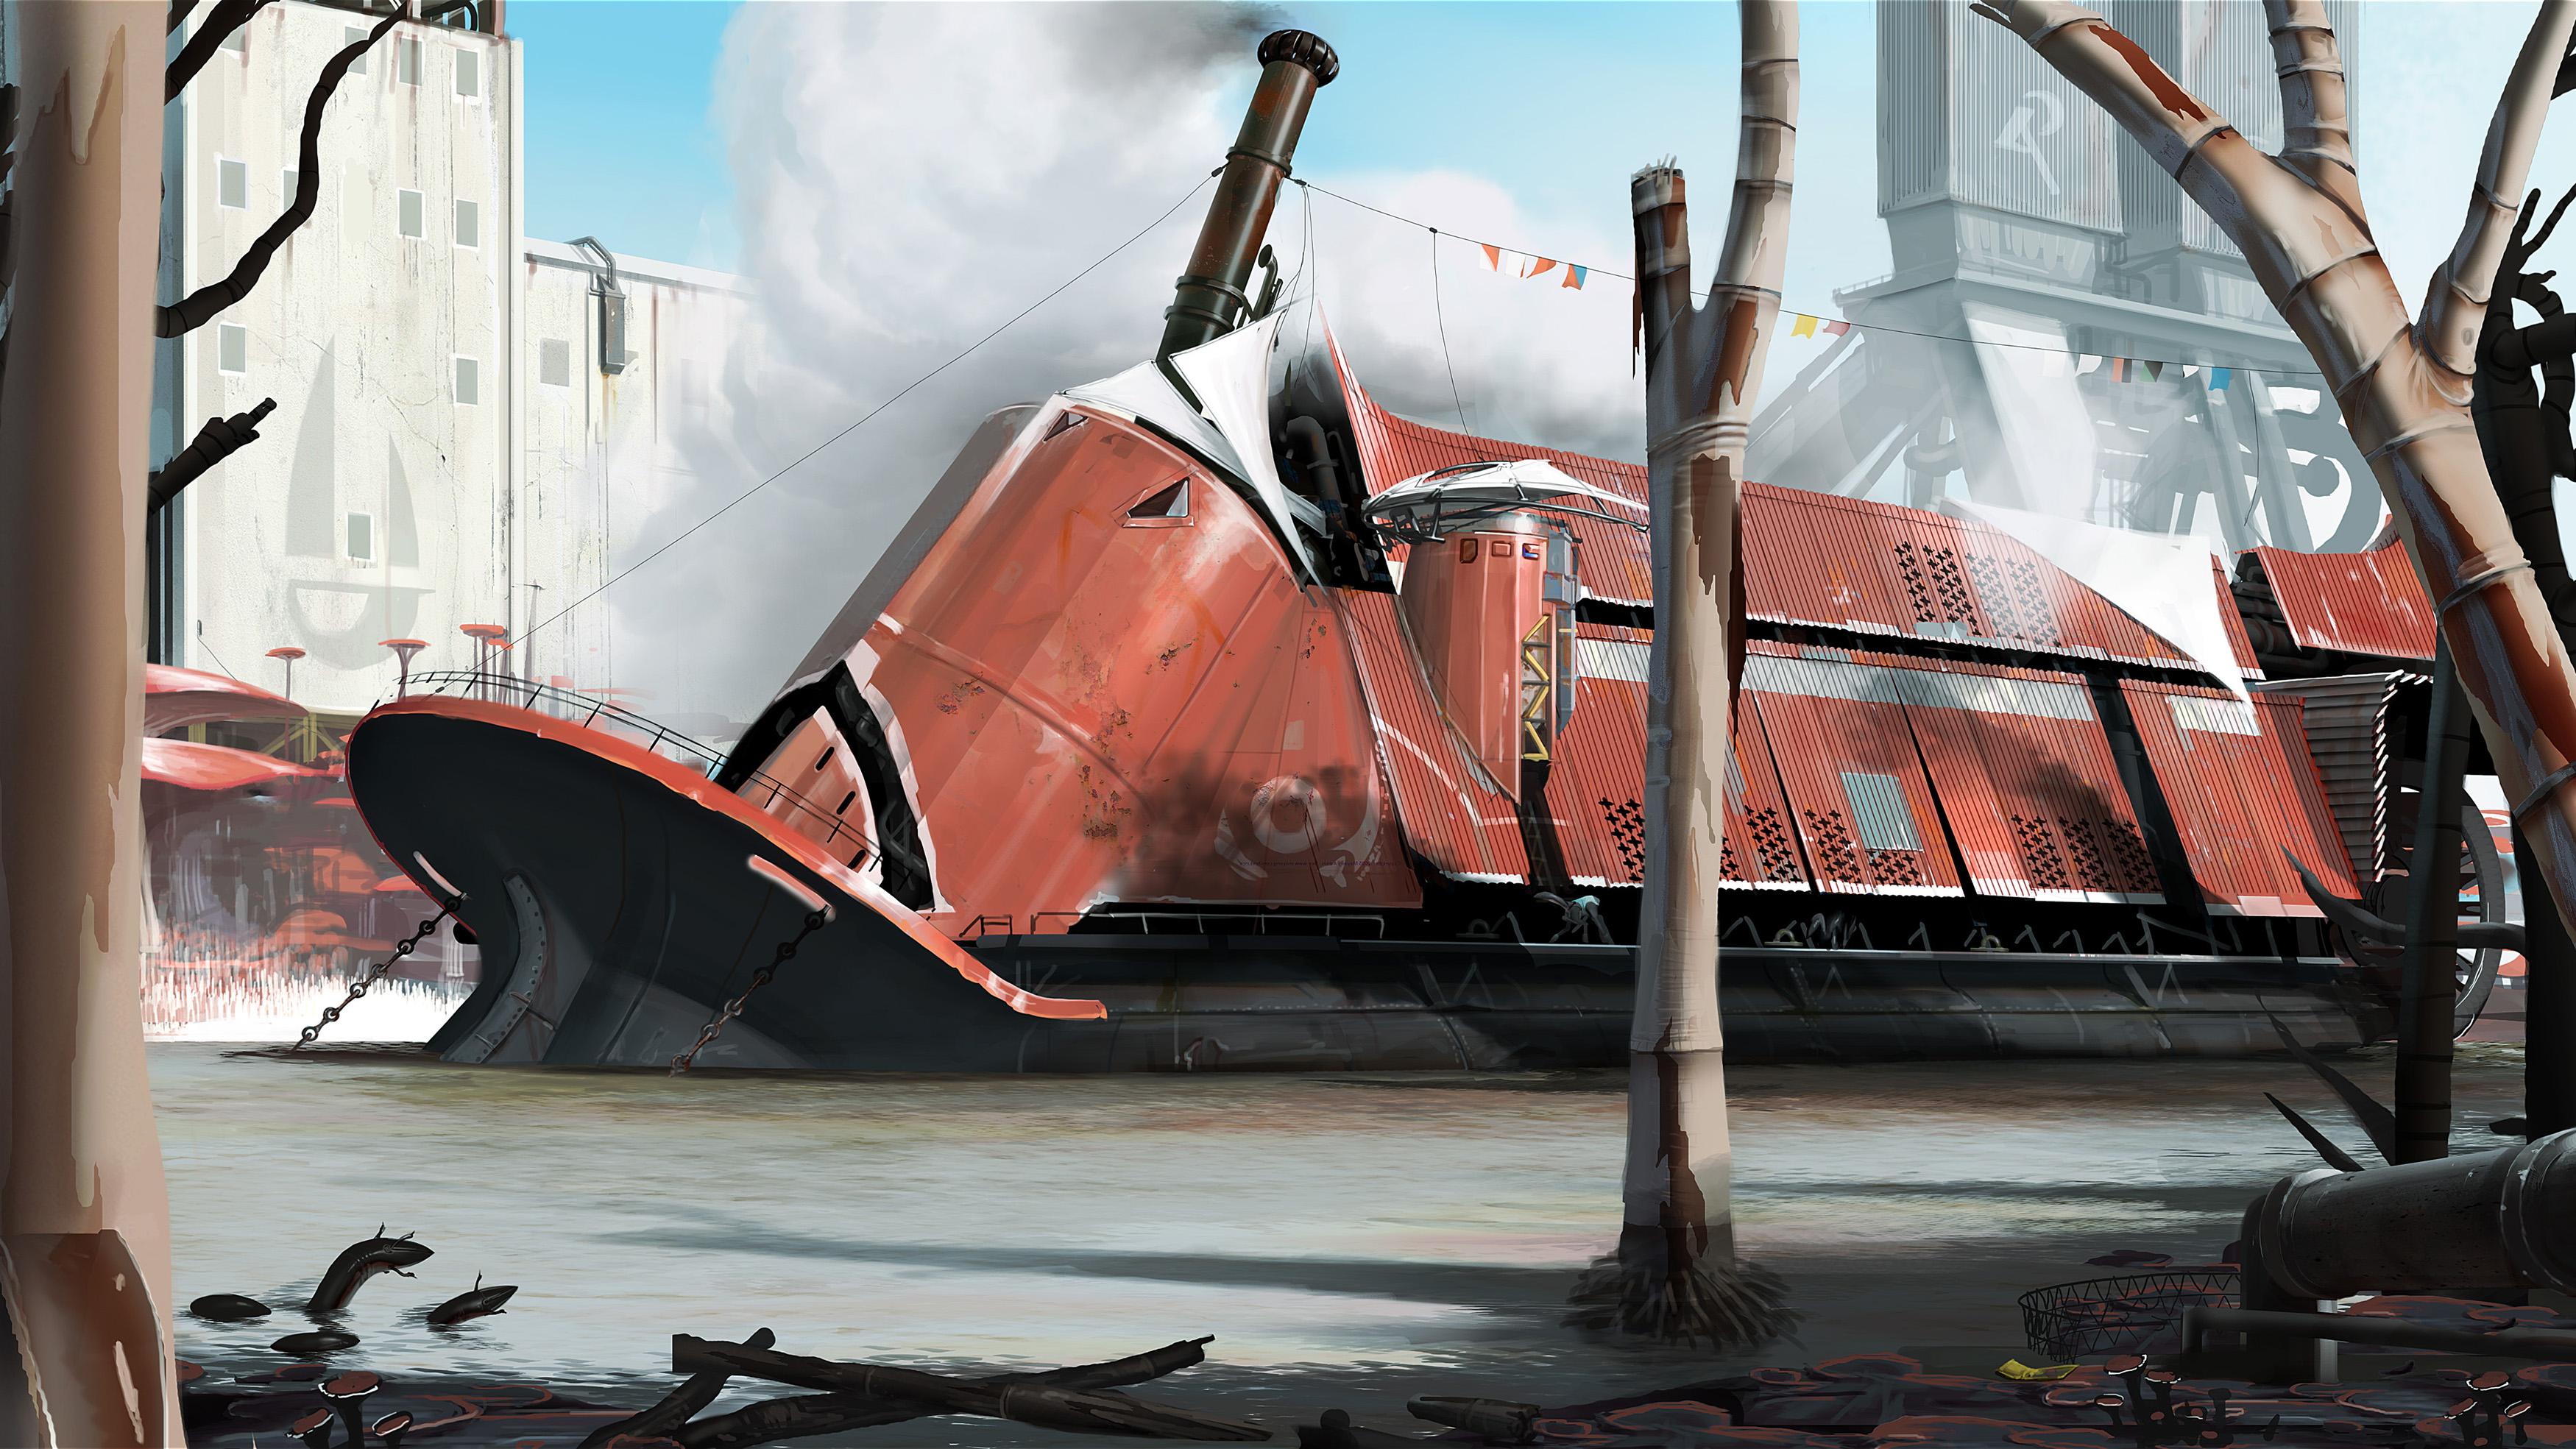 Futuristic Buildings Drawings Ship Drawing Sci-fi Futuristic